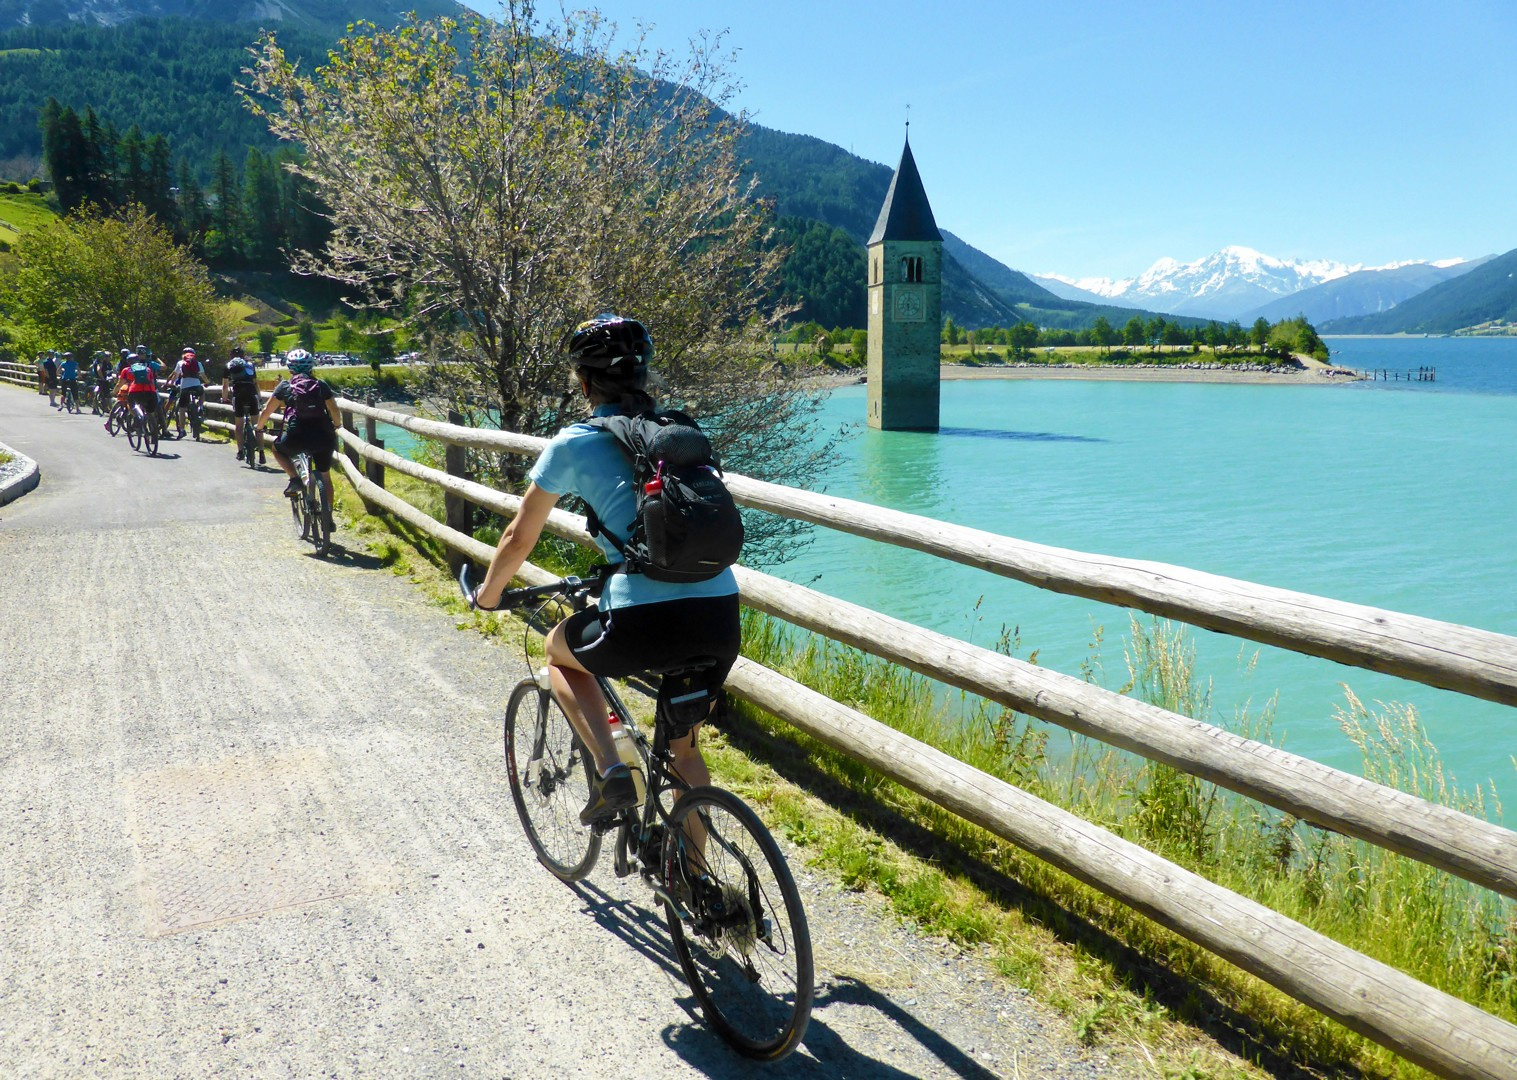 la-via-claudia-guided-cycling-holiday-river-etsch.jpg - Austria and Italy - La Via Claudia - Guided Leisure Cycling Holiday - Leisure Cycling